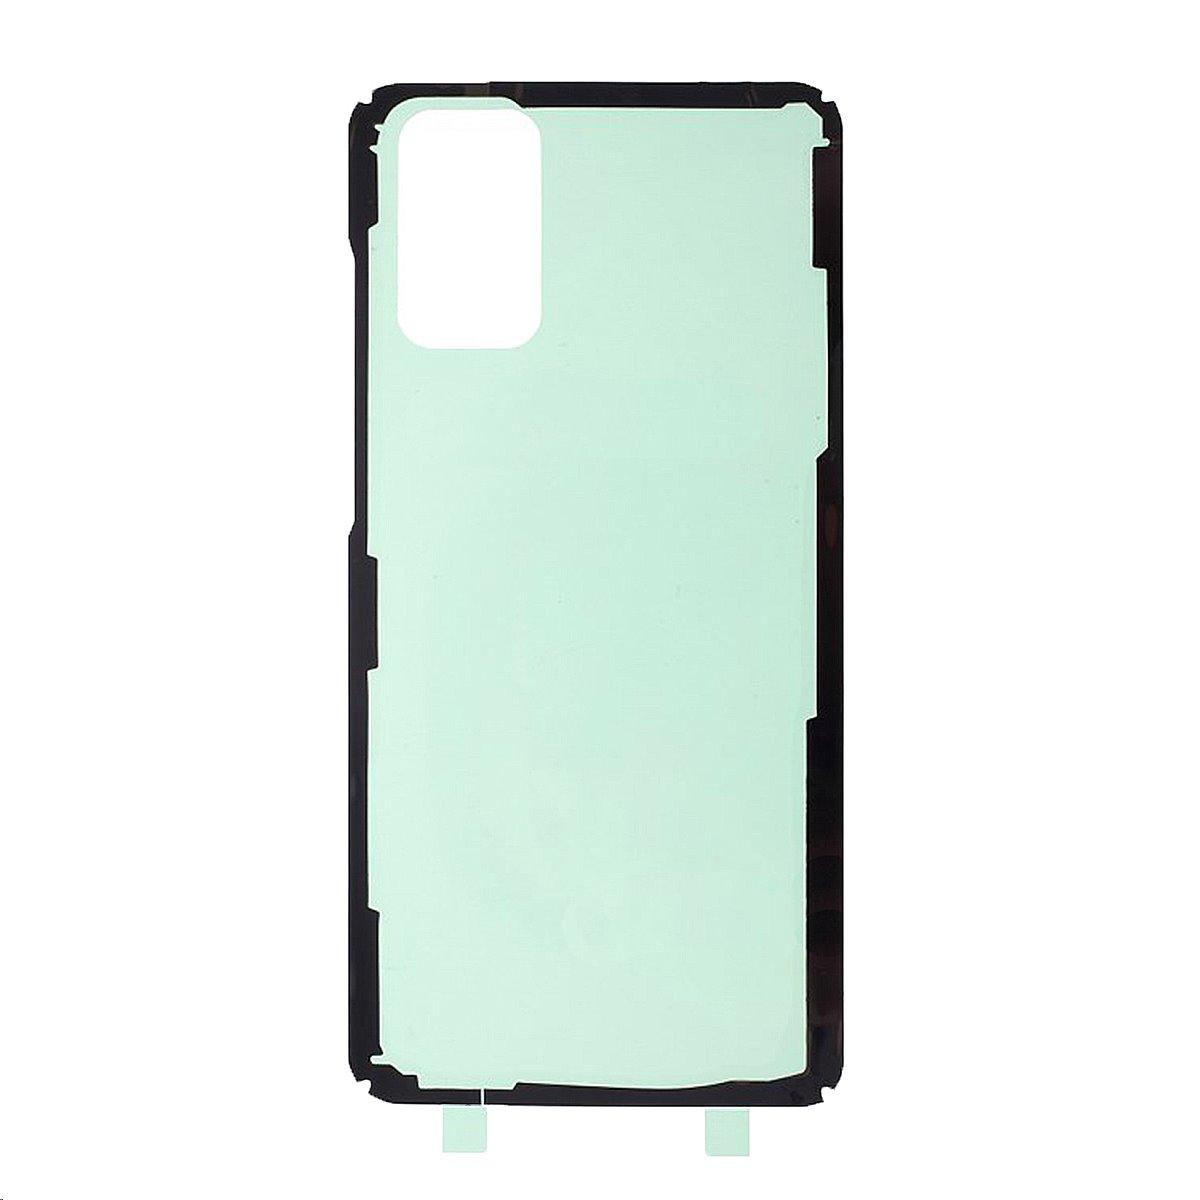 Lepicí páska pod kryt baterie pro Samsung Galaxy S20+